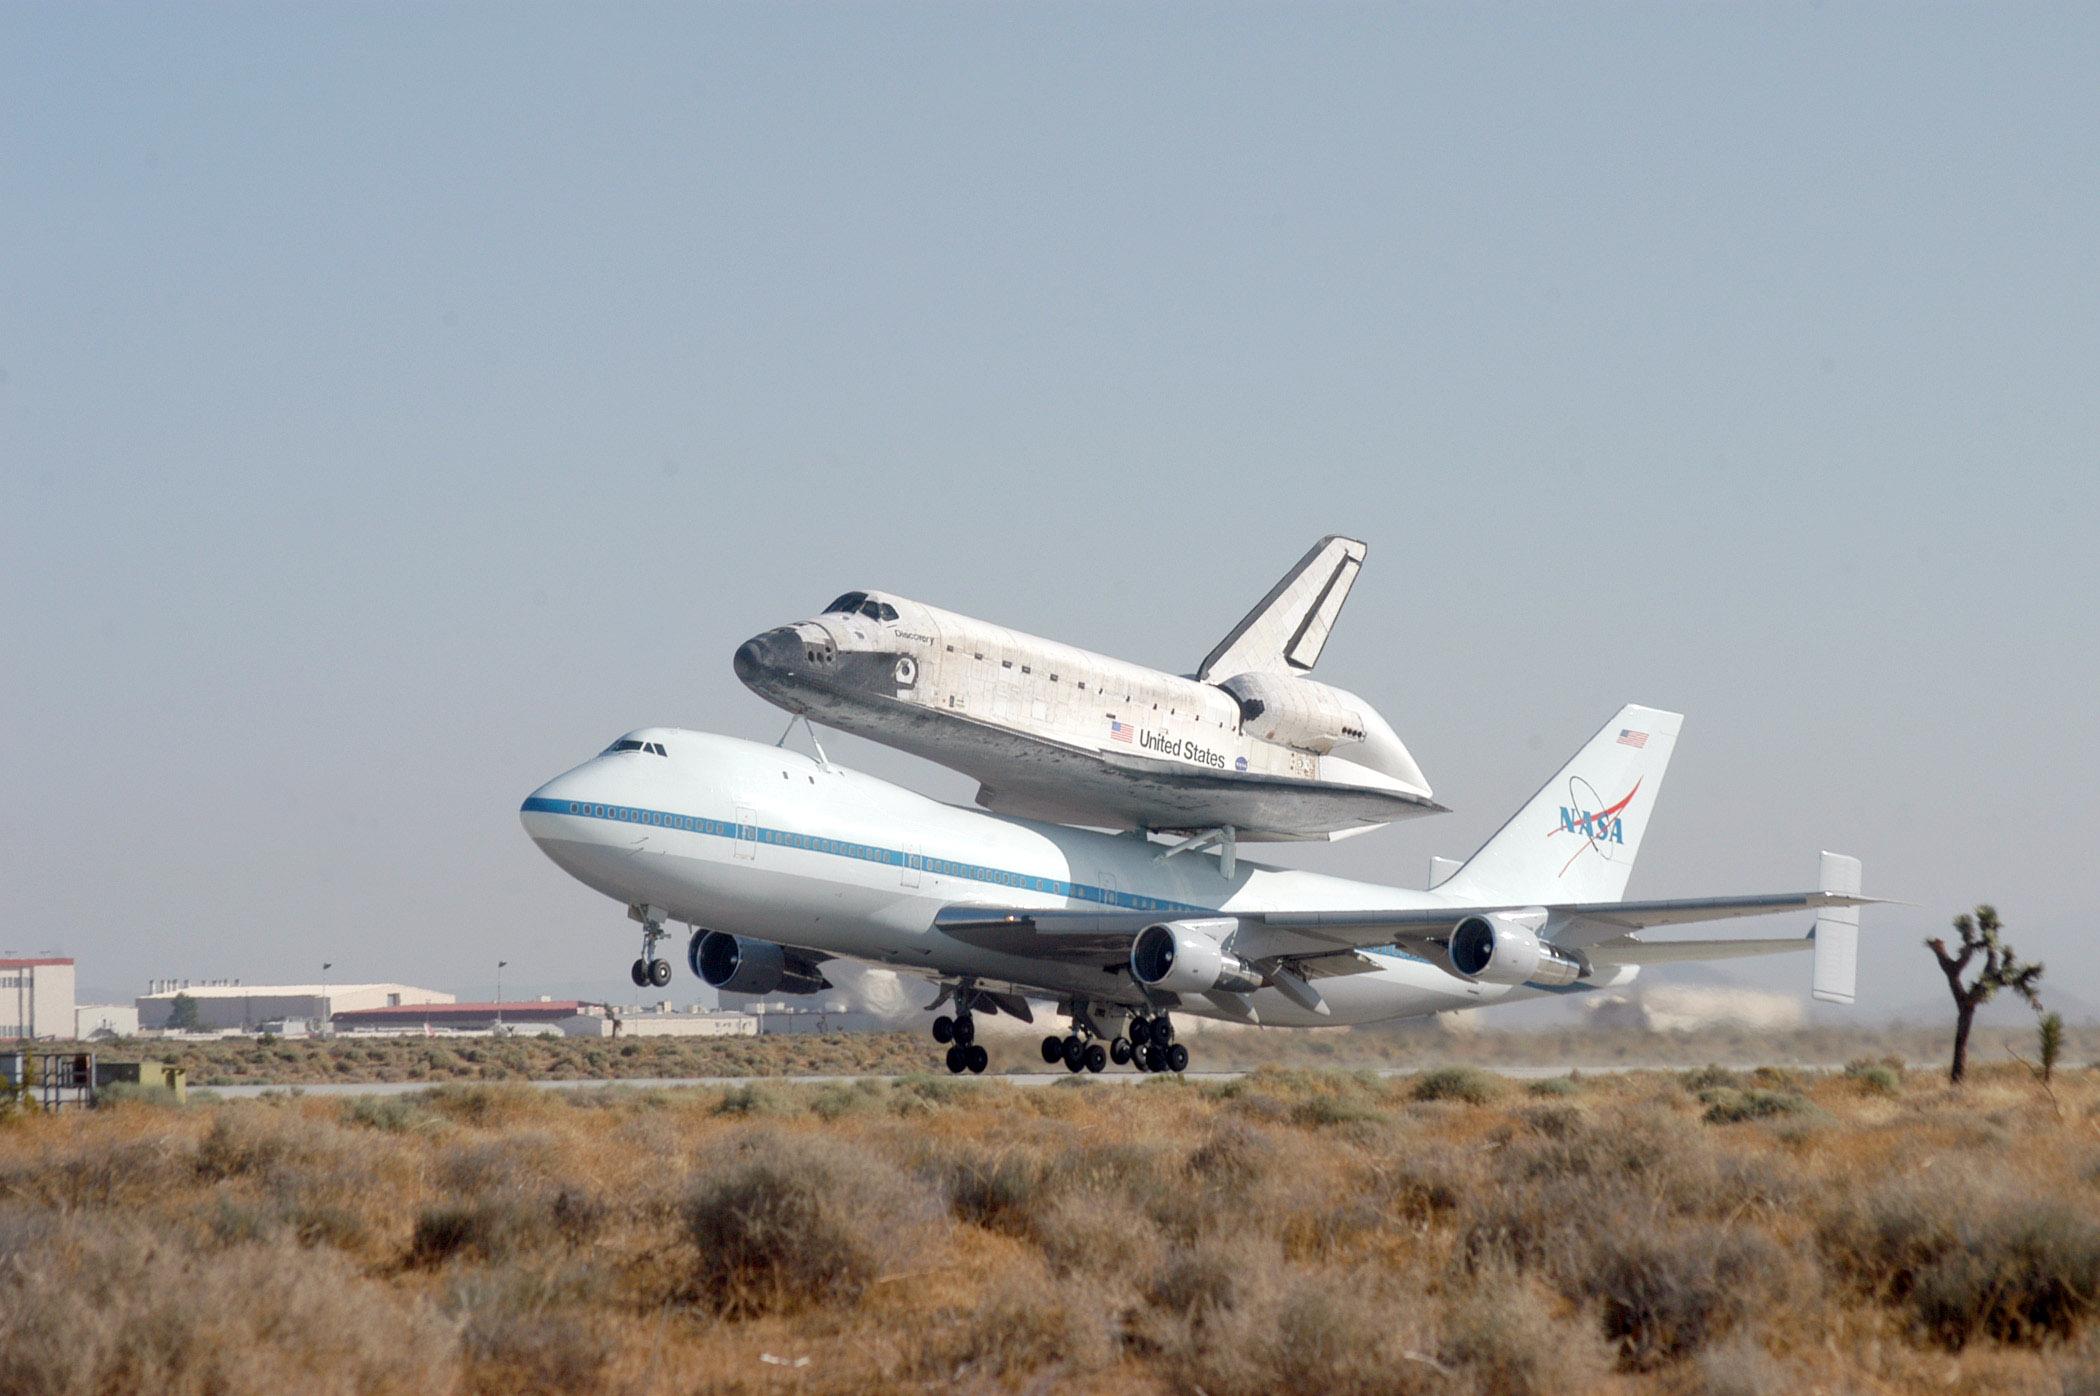 nasa transport plane - photo #19